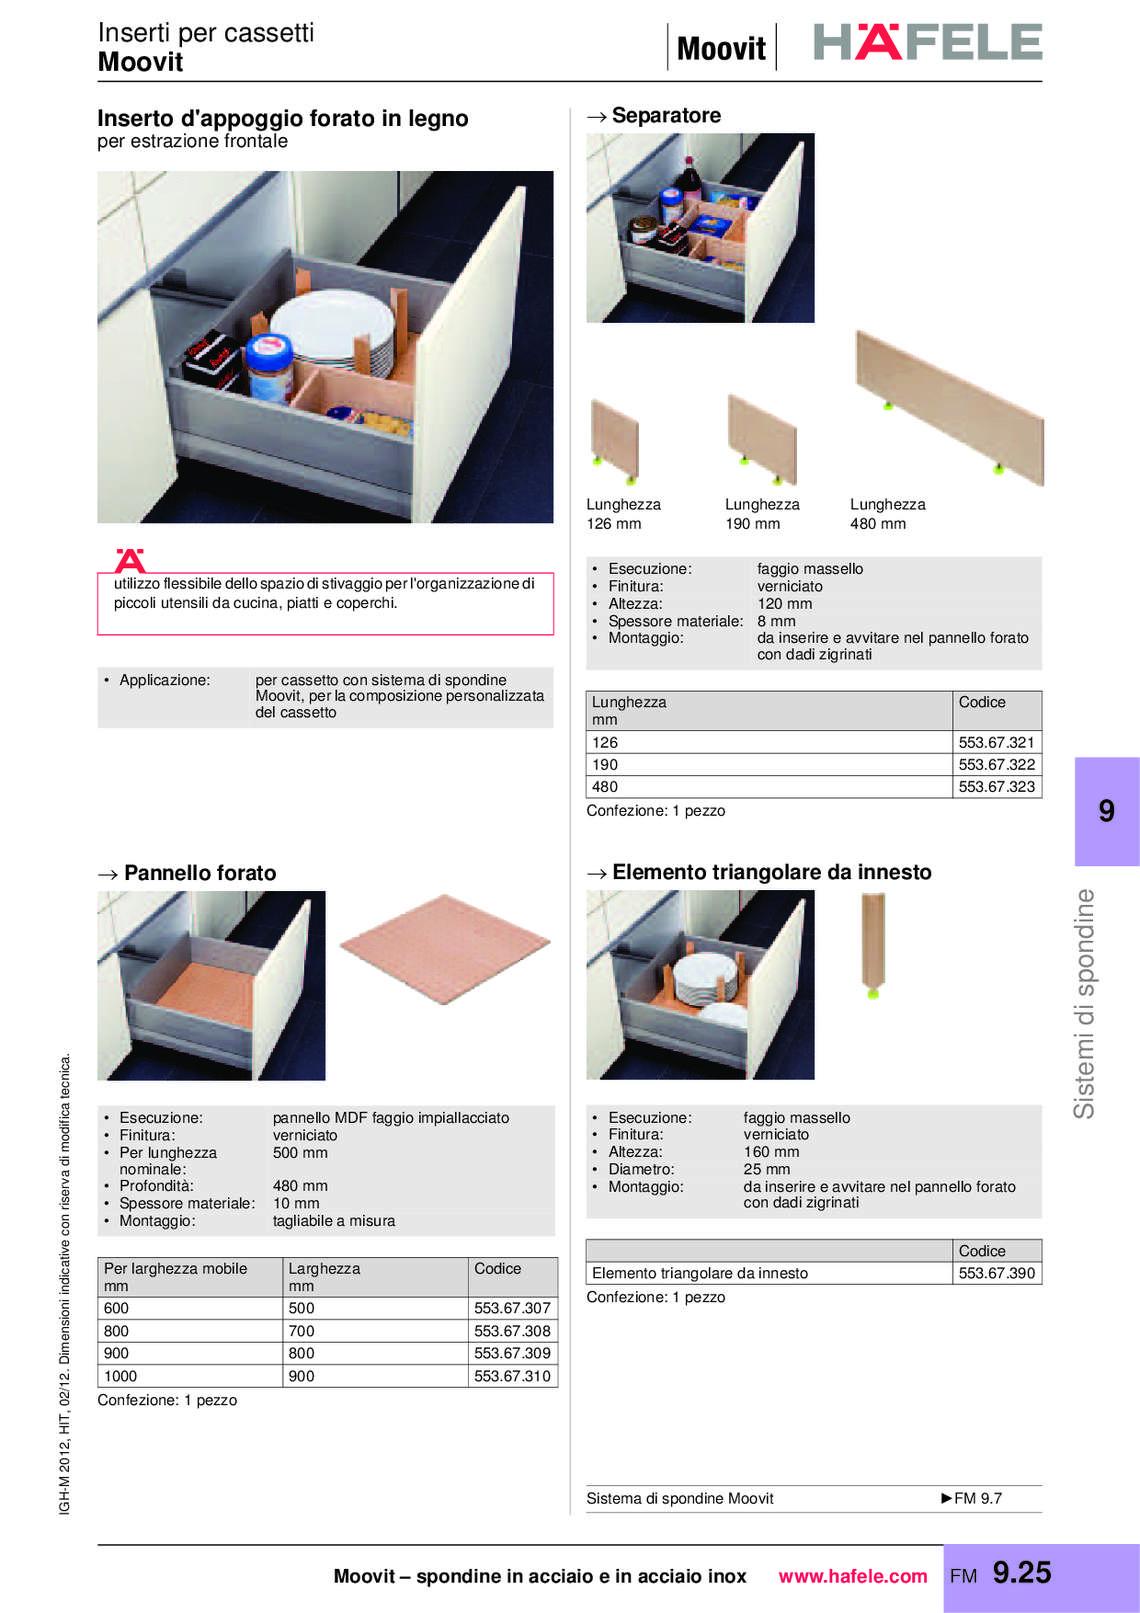 hafele-spondine-e-guide-per-mobili_40_038.jpg